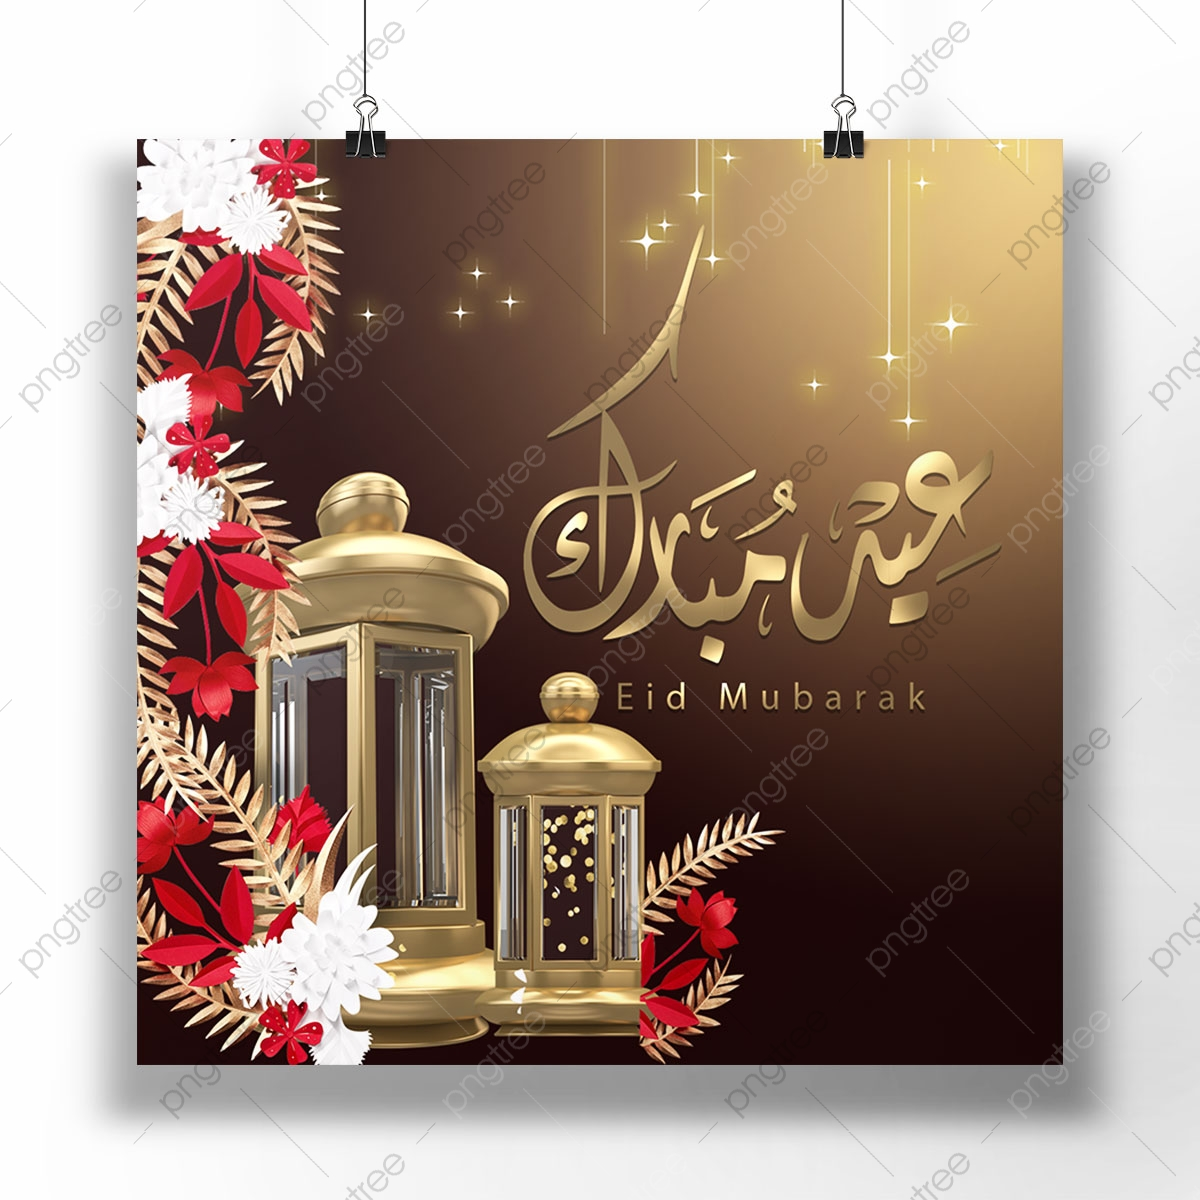 Eid Mubarak Kartu Ucapan Dapat Diedit Psd Dengan Lentera Emas Dan Kaligrafi Arab Templat Untuk Unduh Gratis Di Pngtree